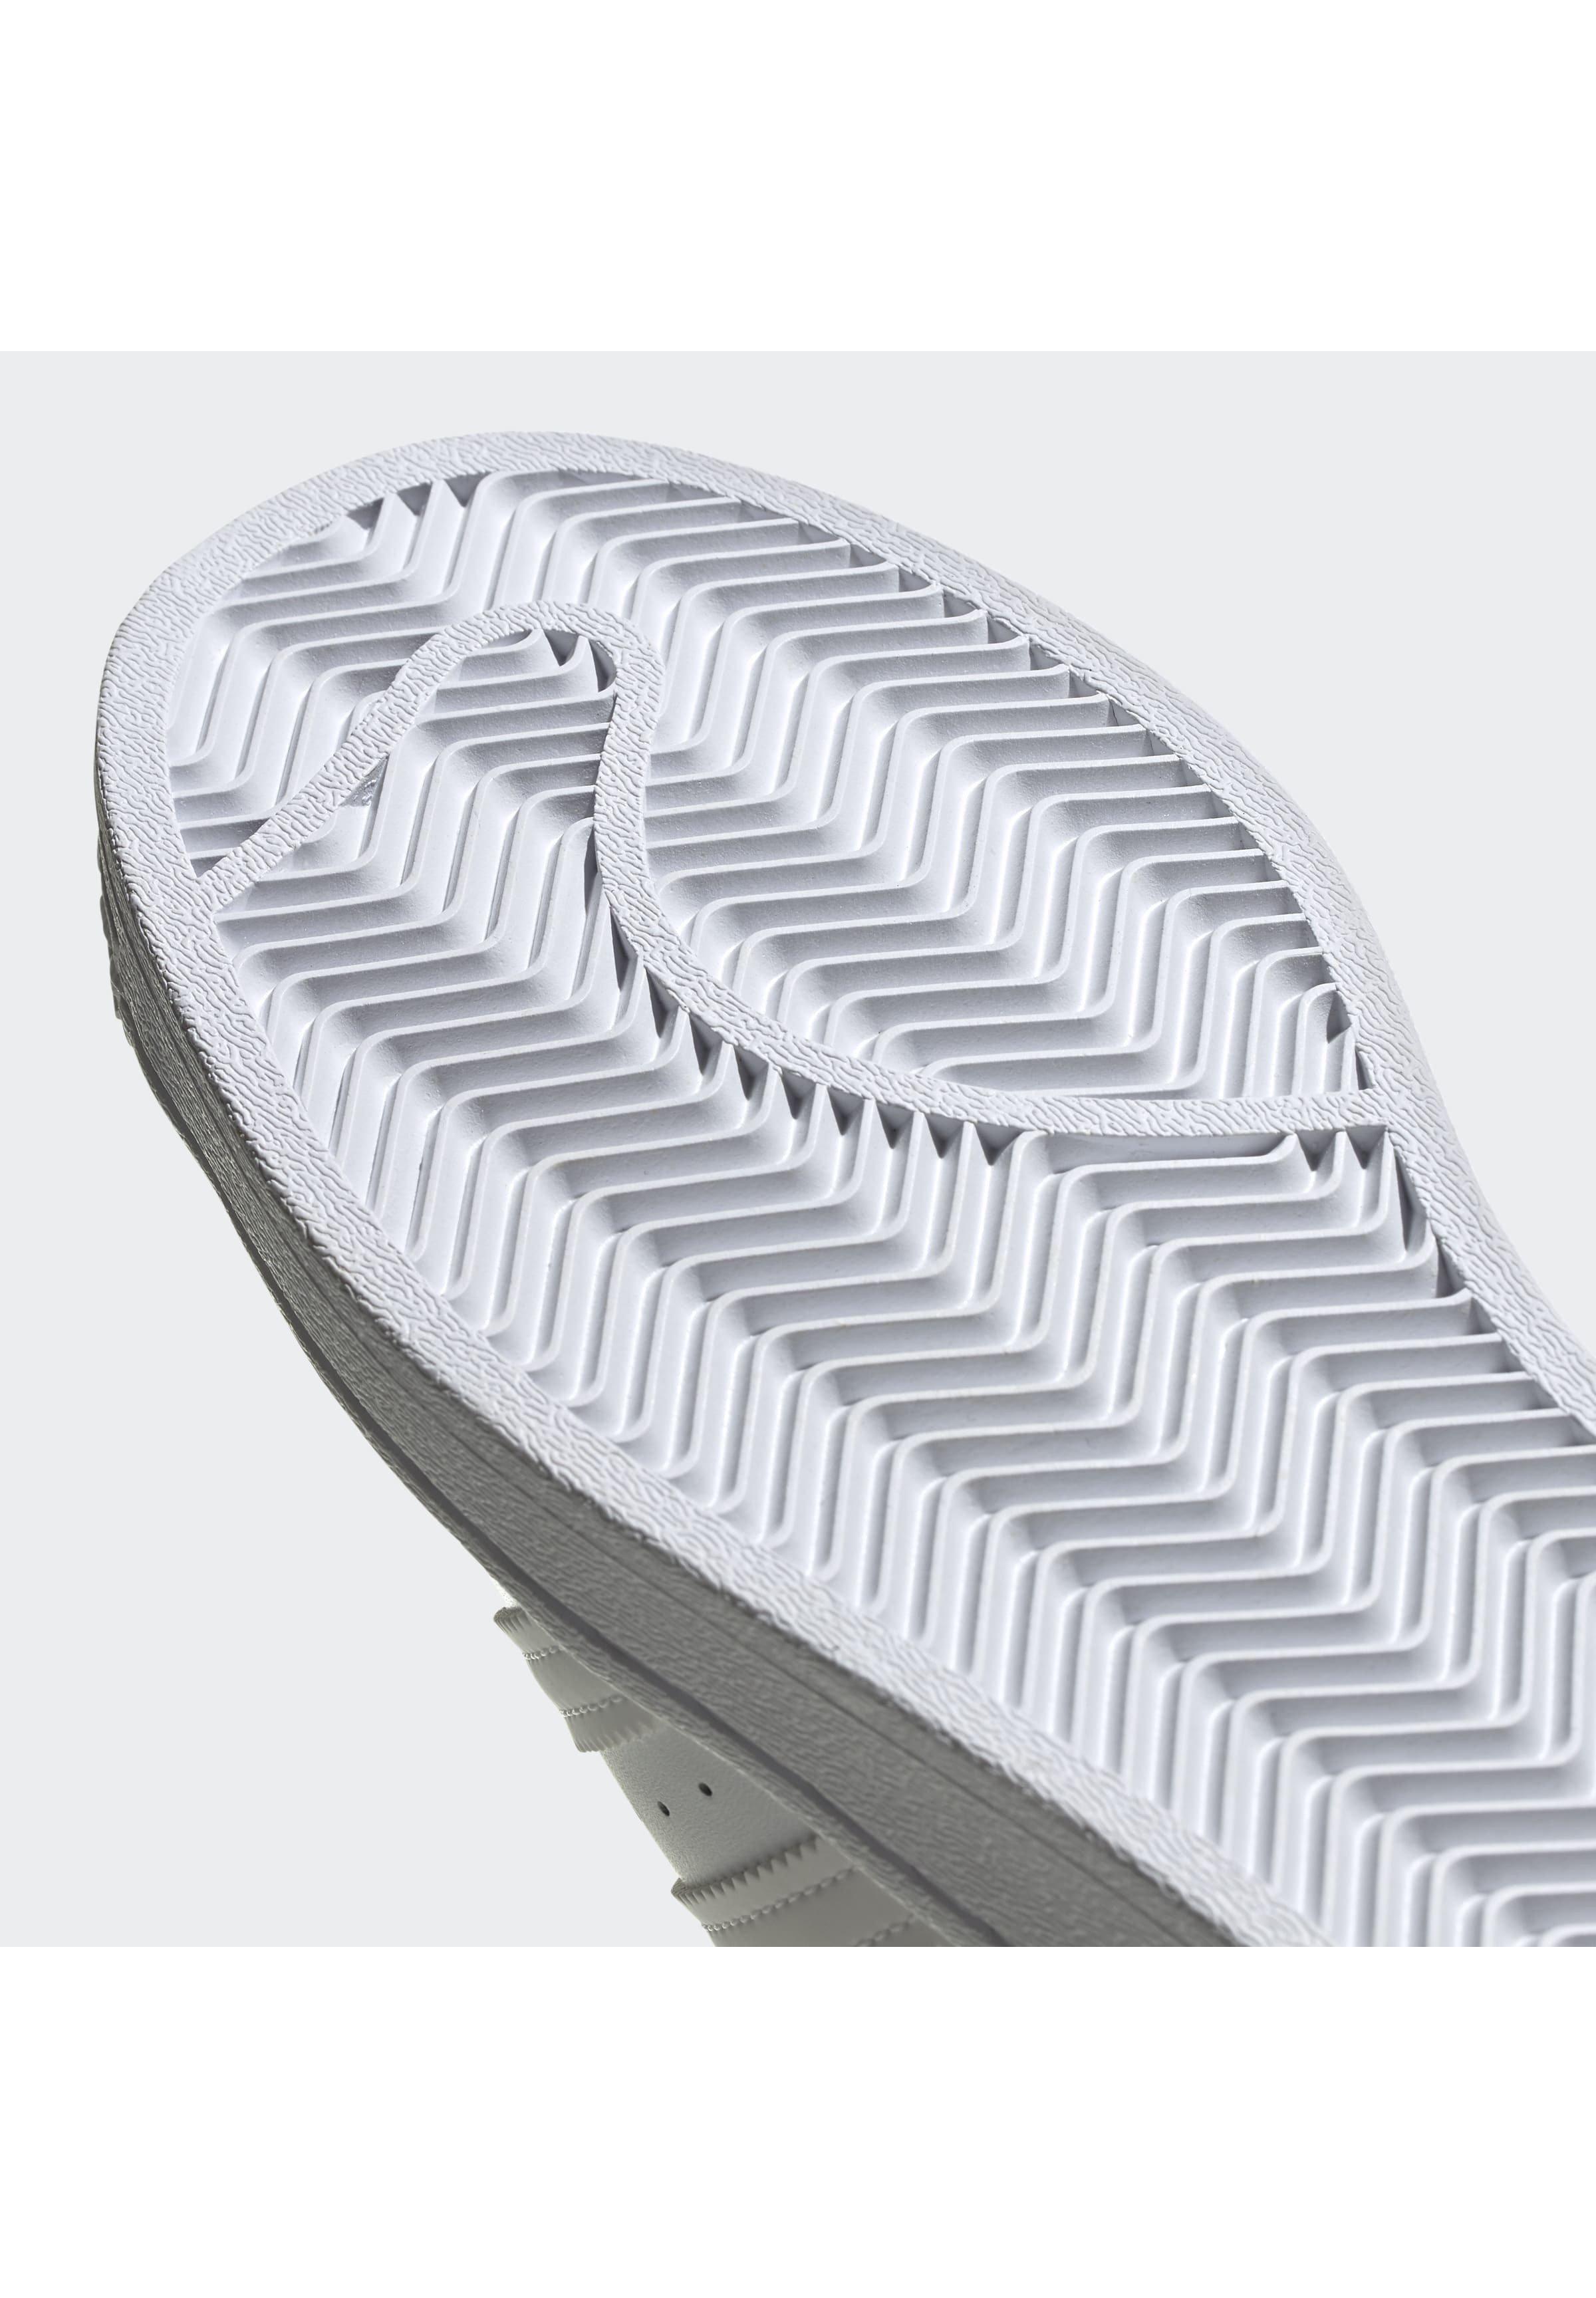 Adidas Originals 2020-04-02 Superstar Shoes - Joggesko White